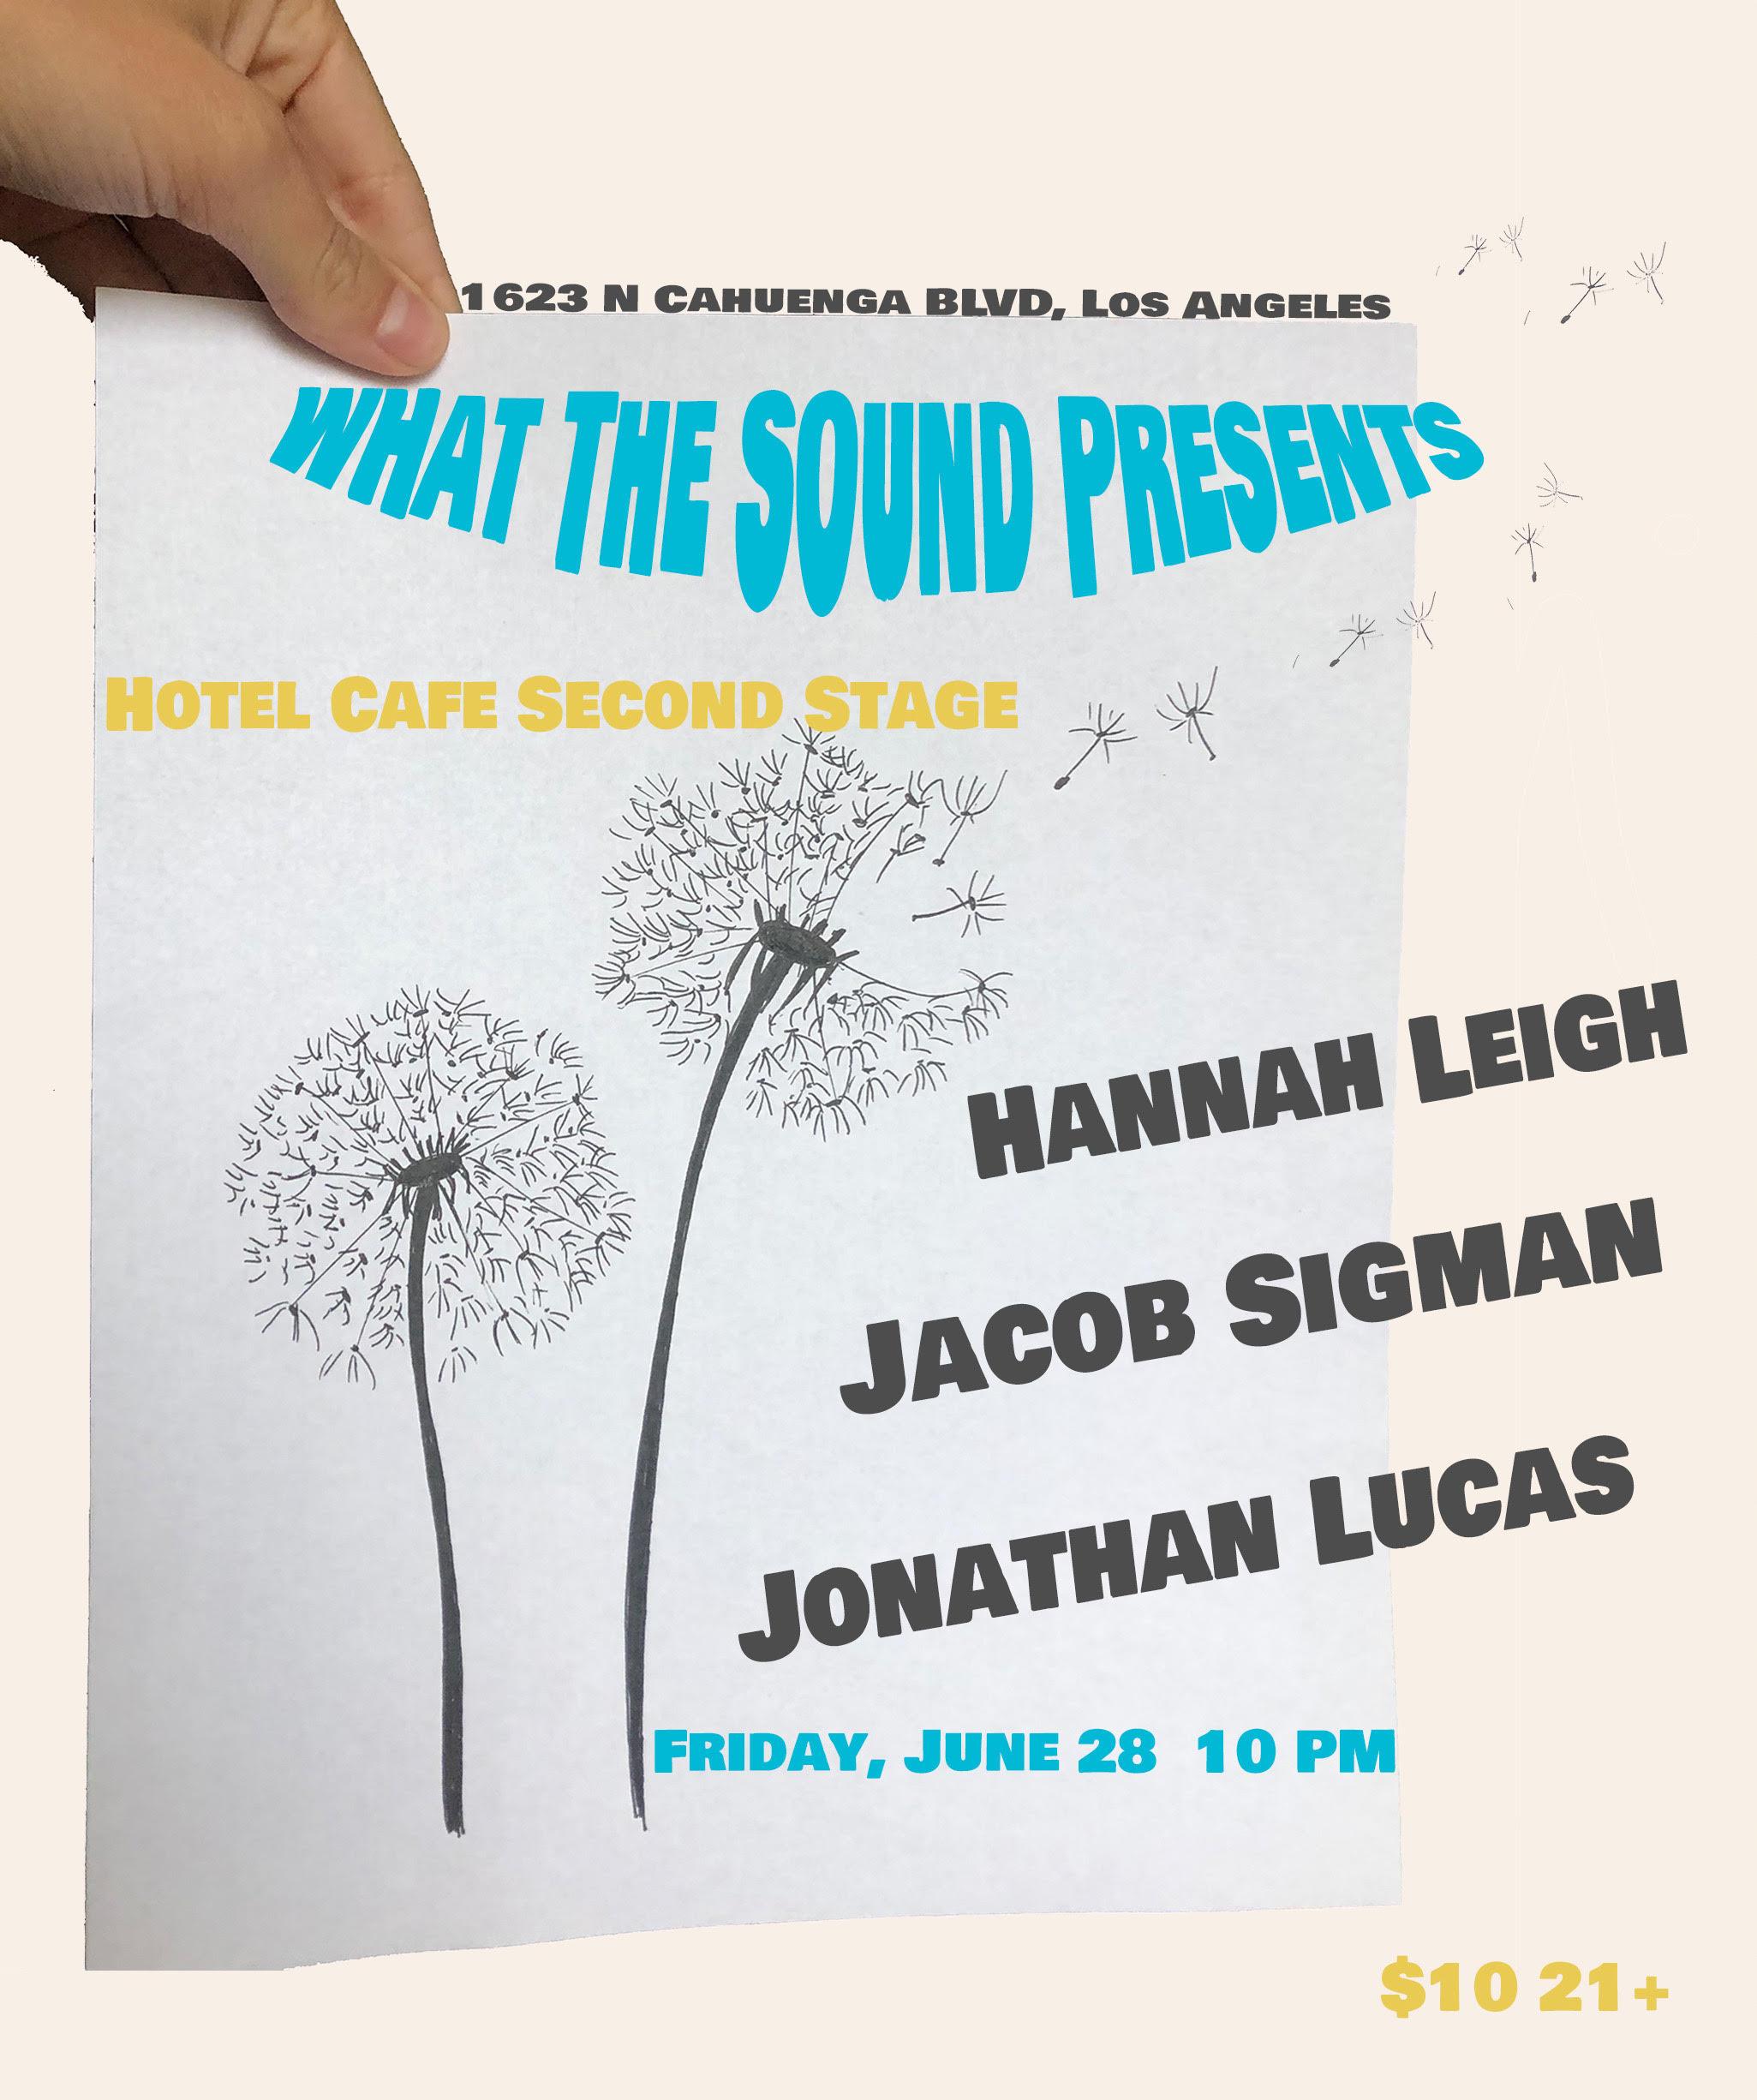 HANNAH LEIGH / JACOB SIGMAN / JONATHAN LUCAS - June 28, 2019 @ Hotel Cafe$10 Online / $10 Day of Show21+ Artwork by Eva B. Ross